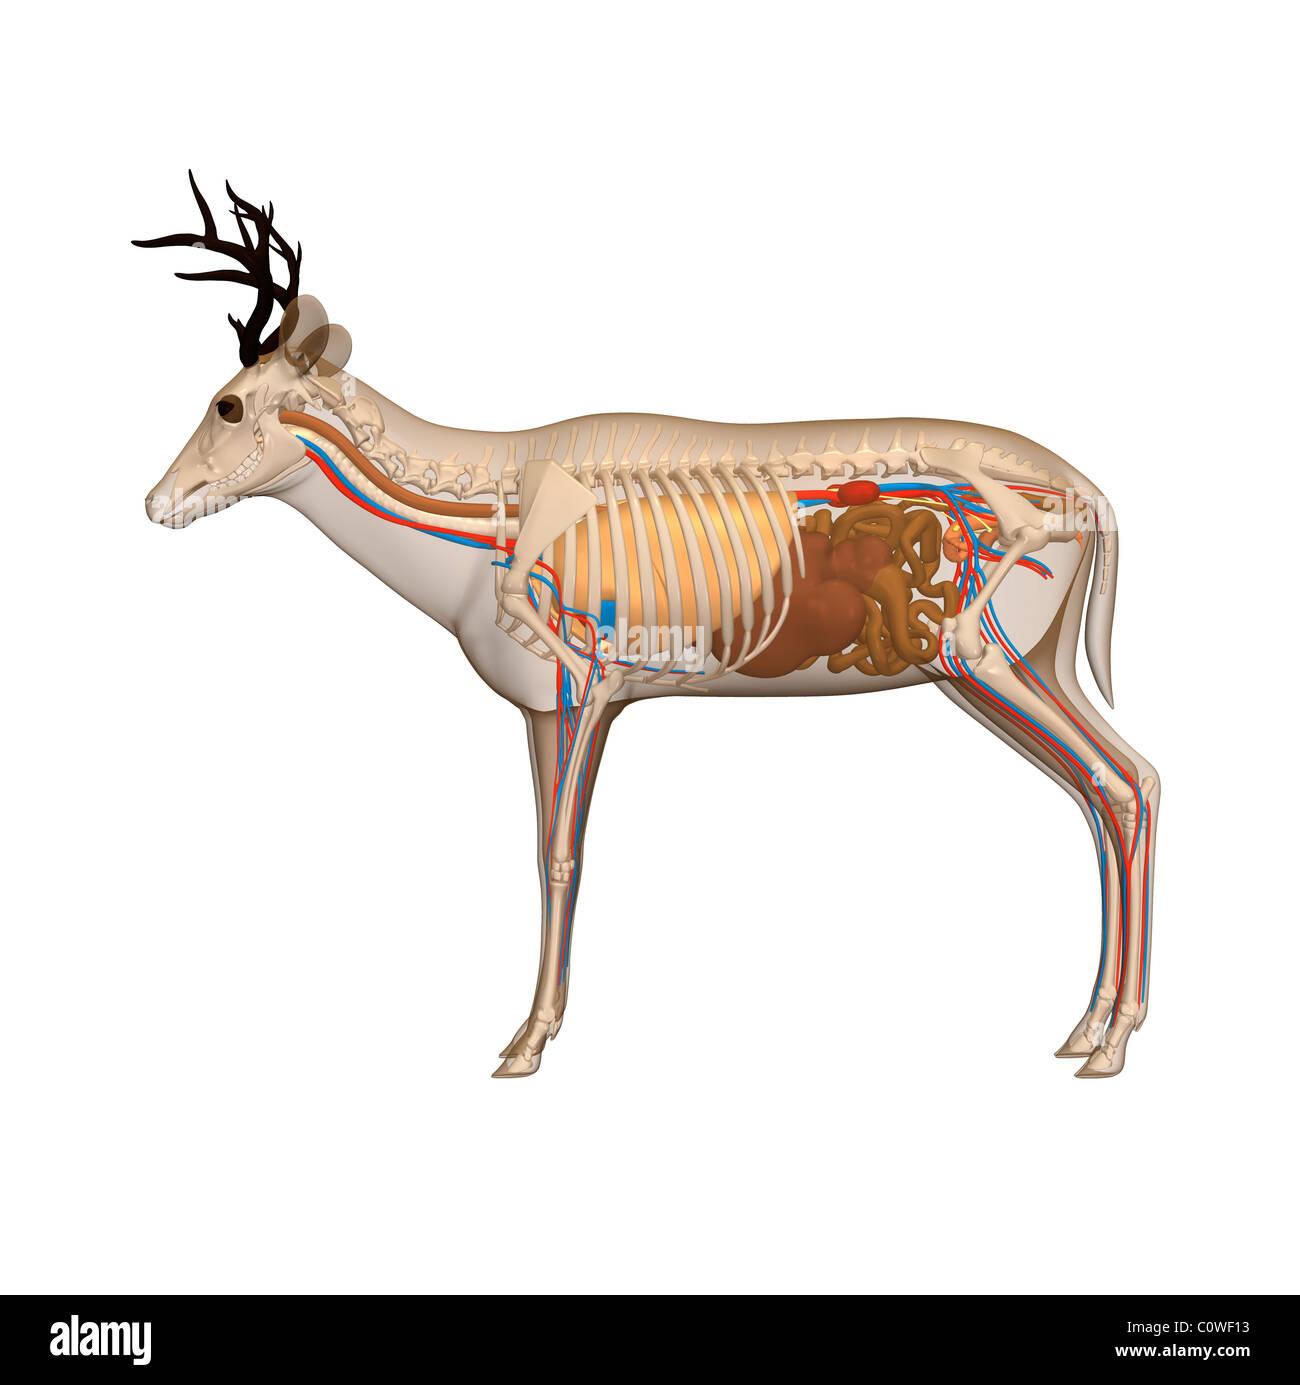 deer anatomy Stock Photo: 34981327 - Alamy